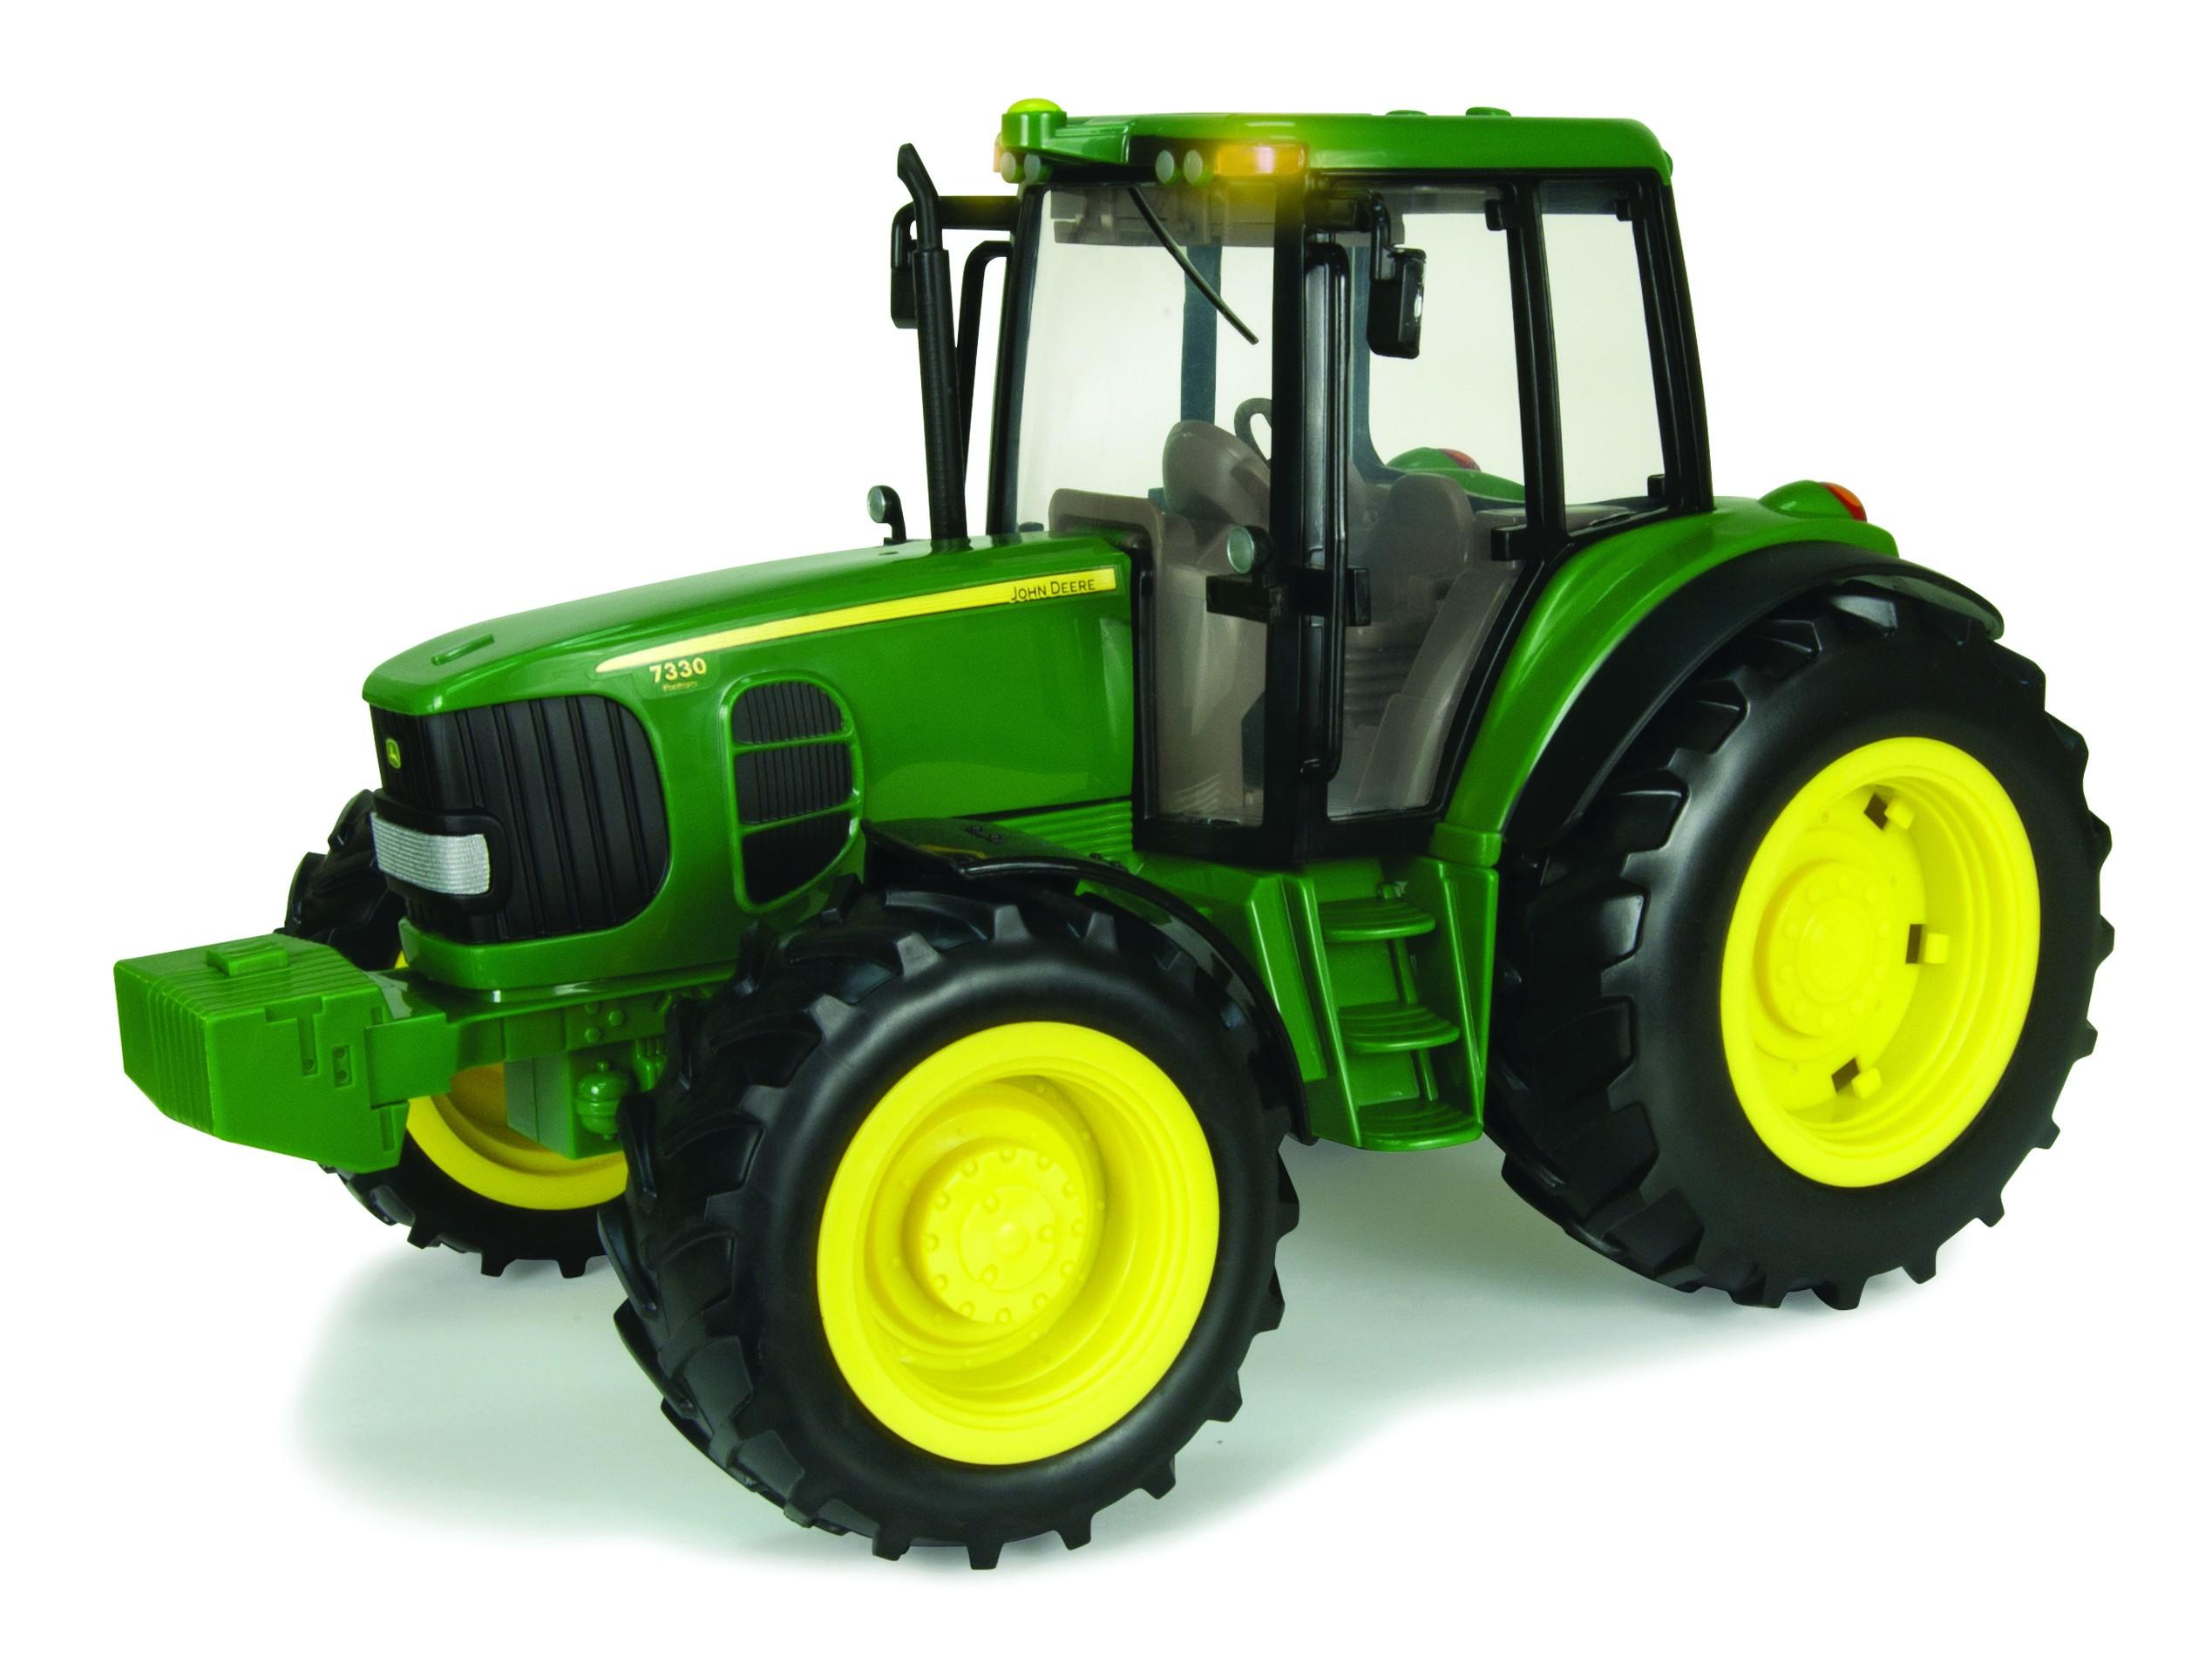 John Deere 7330 Big Farm Tractor   QC Supply